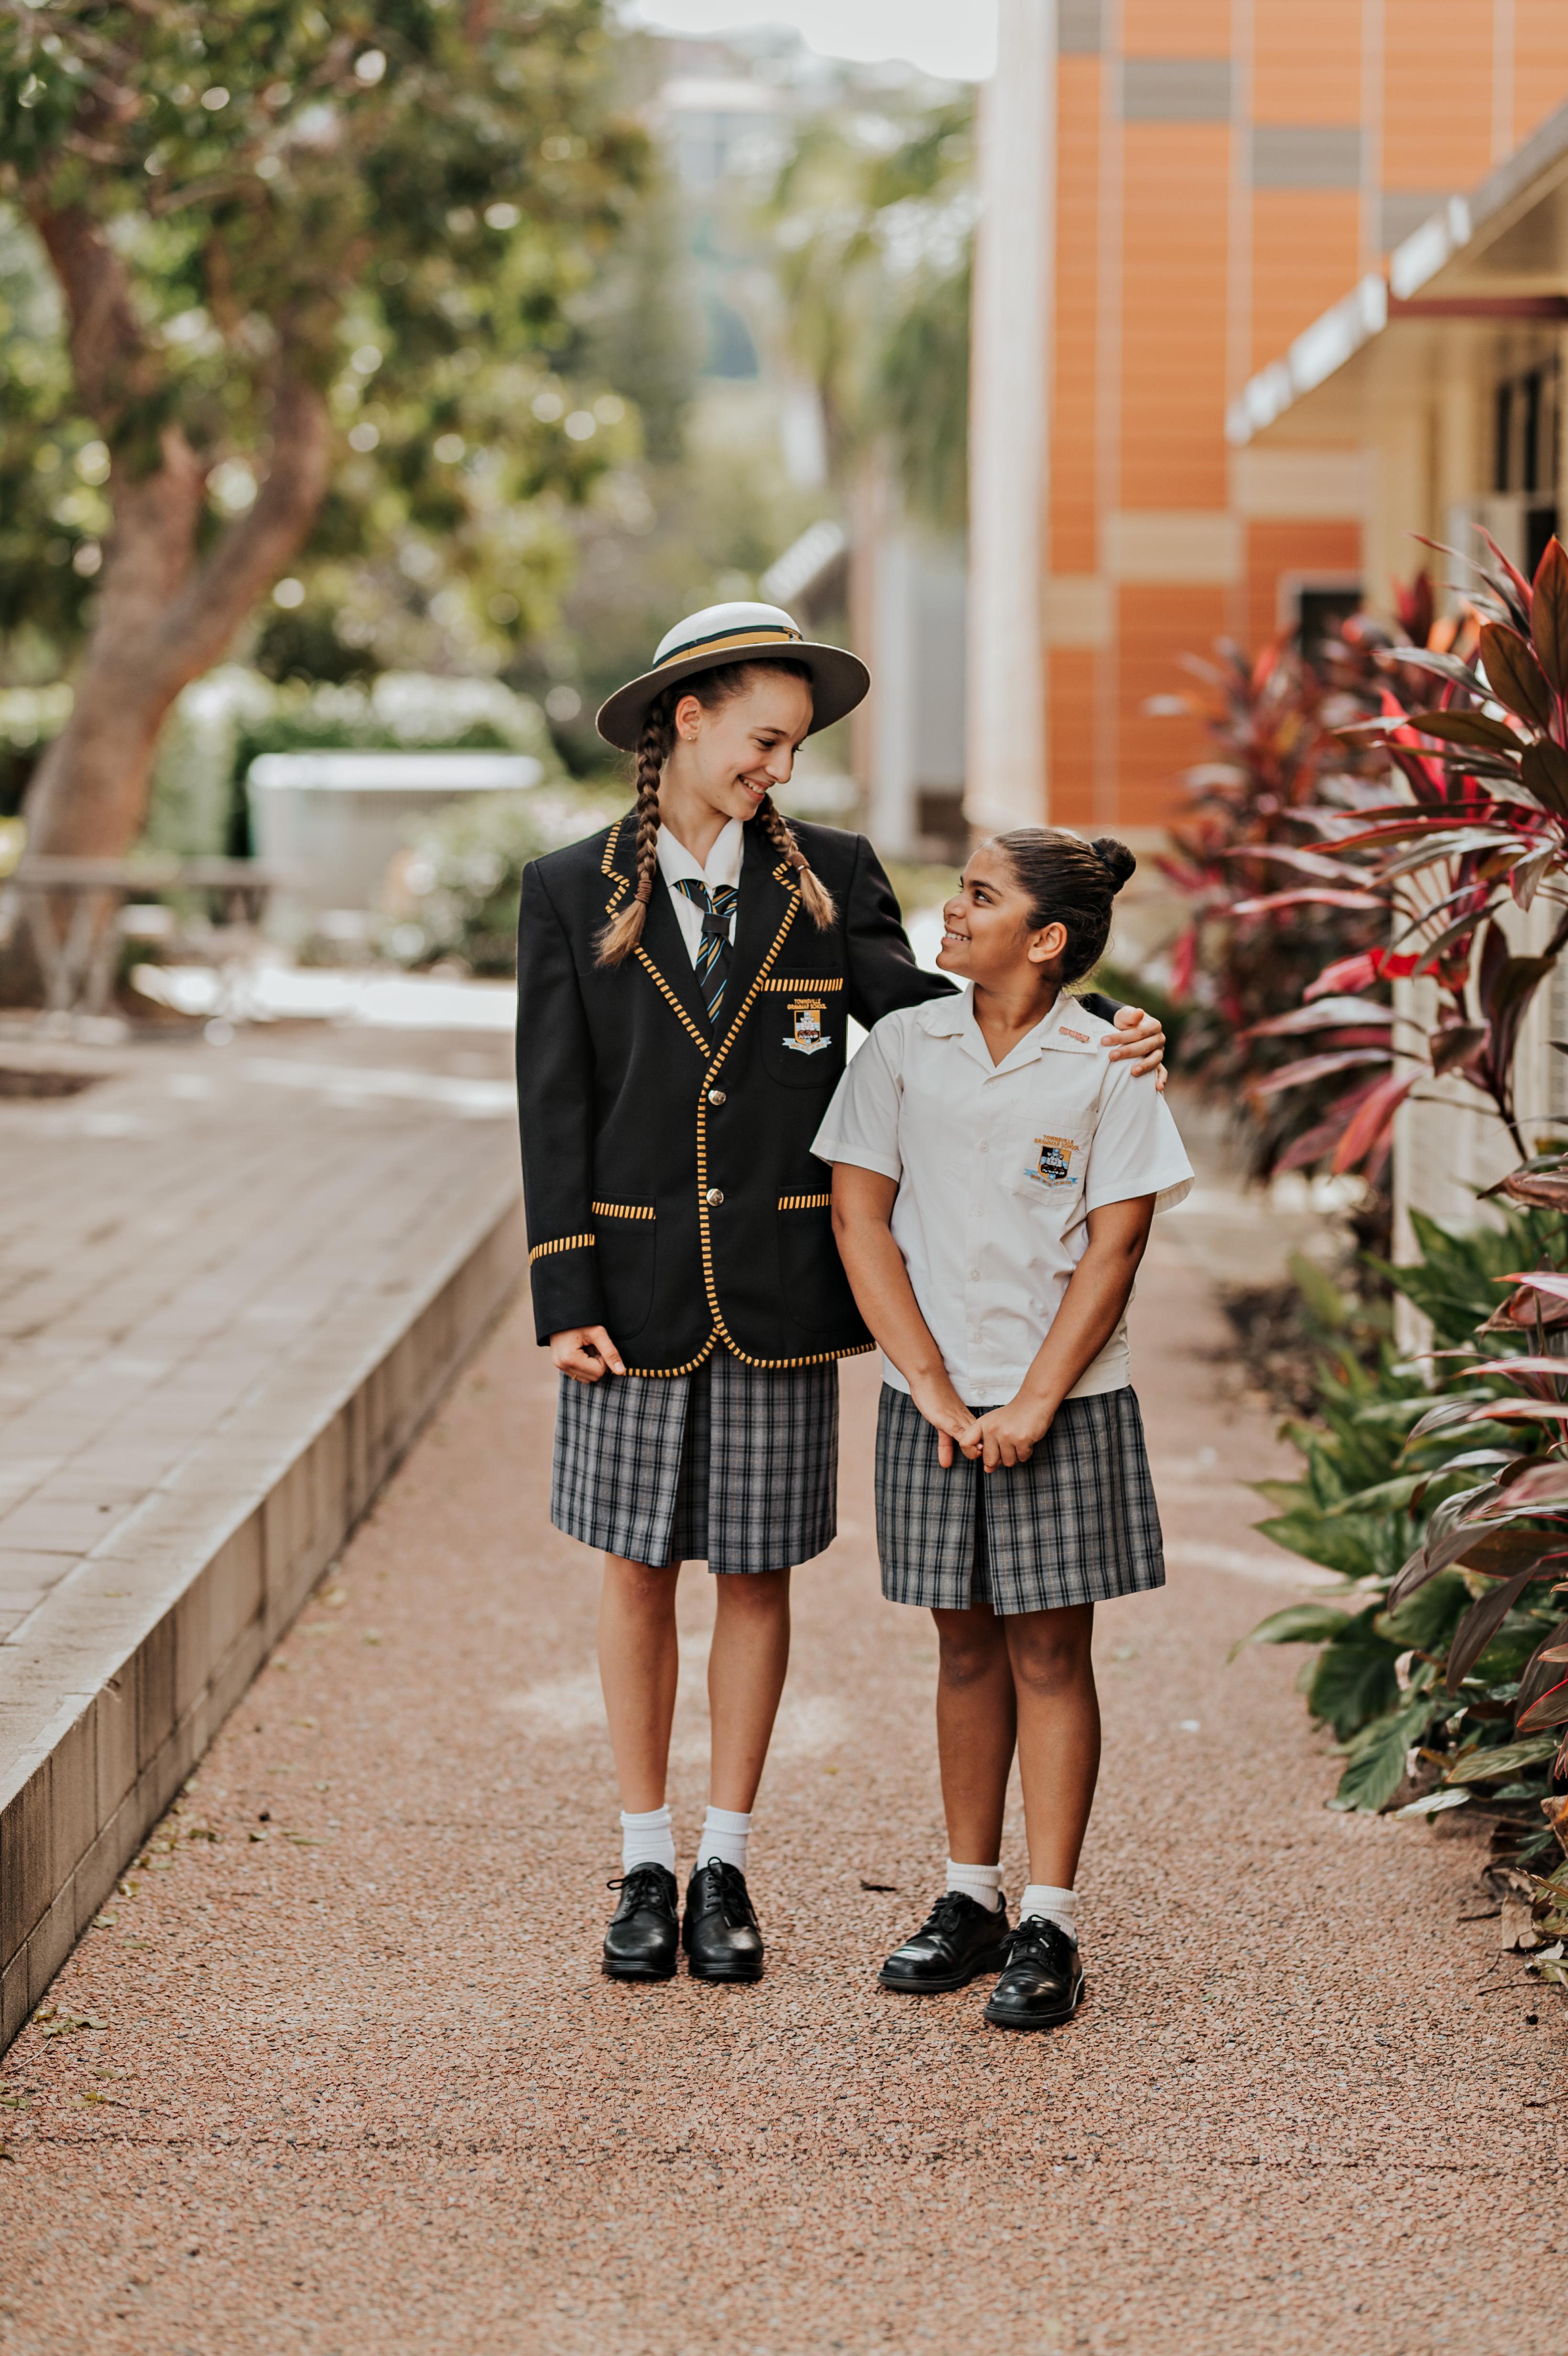 Townsville Grammar School - Annandale, QLD 4814 - (07) 4412 4800 | ShowMeLocal.com